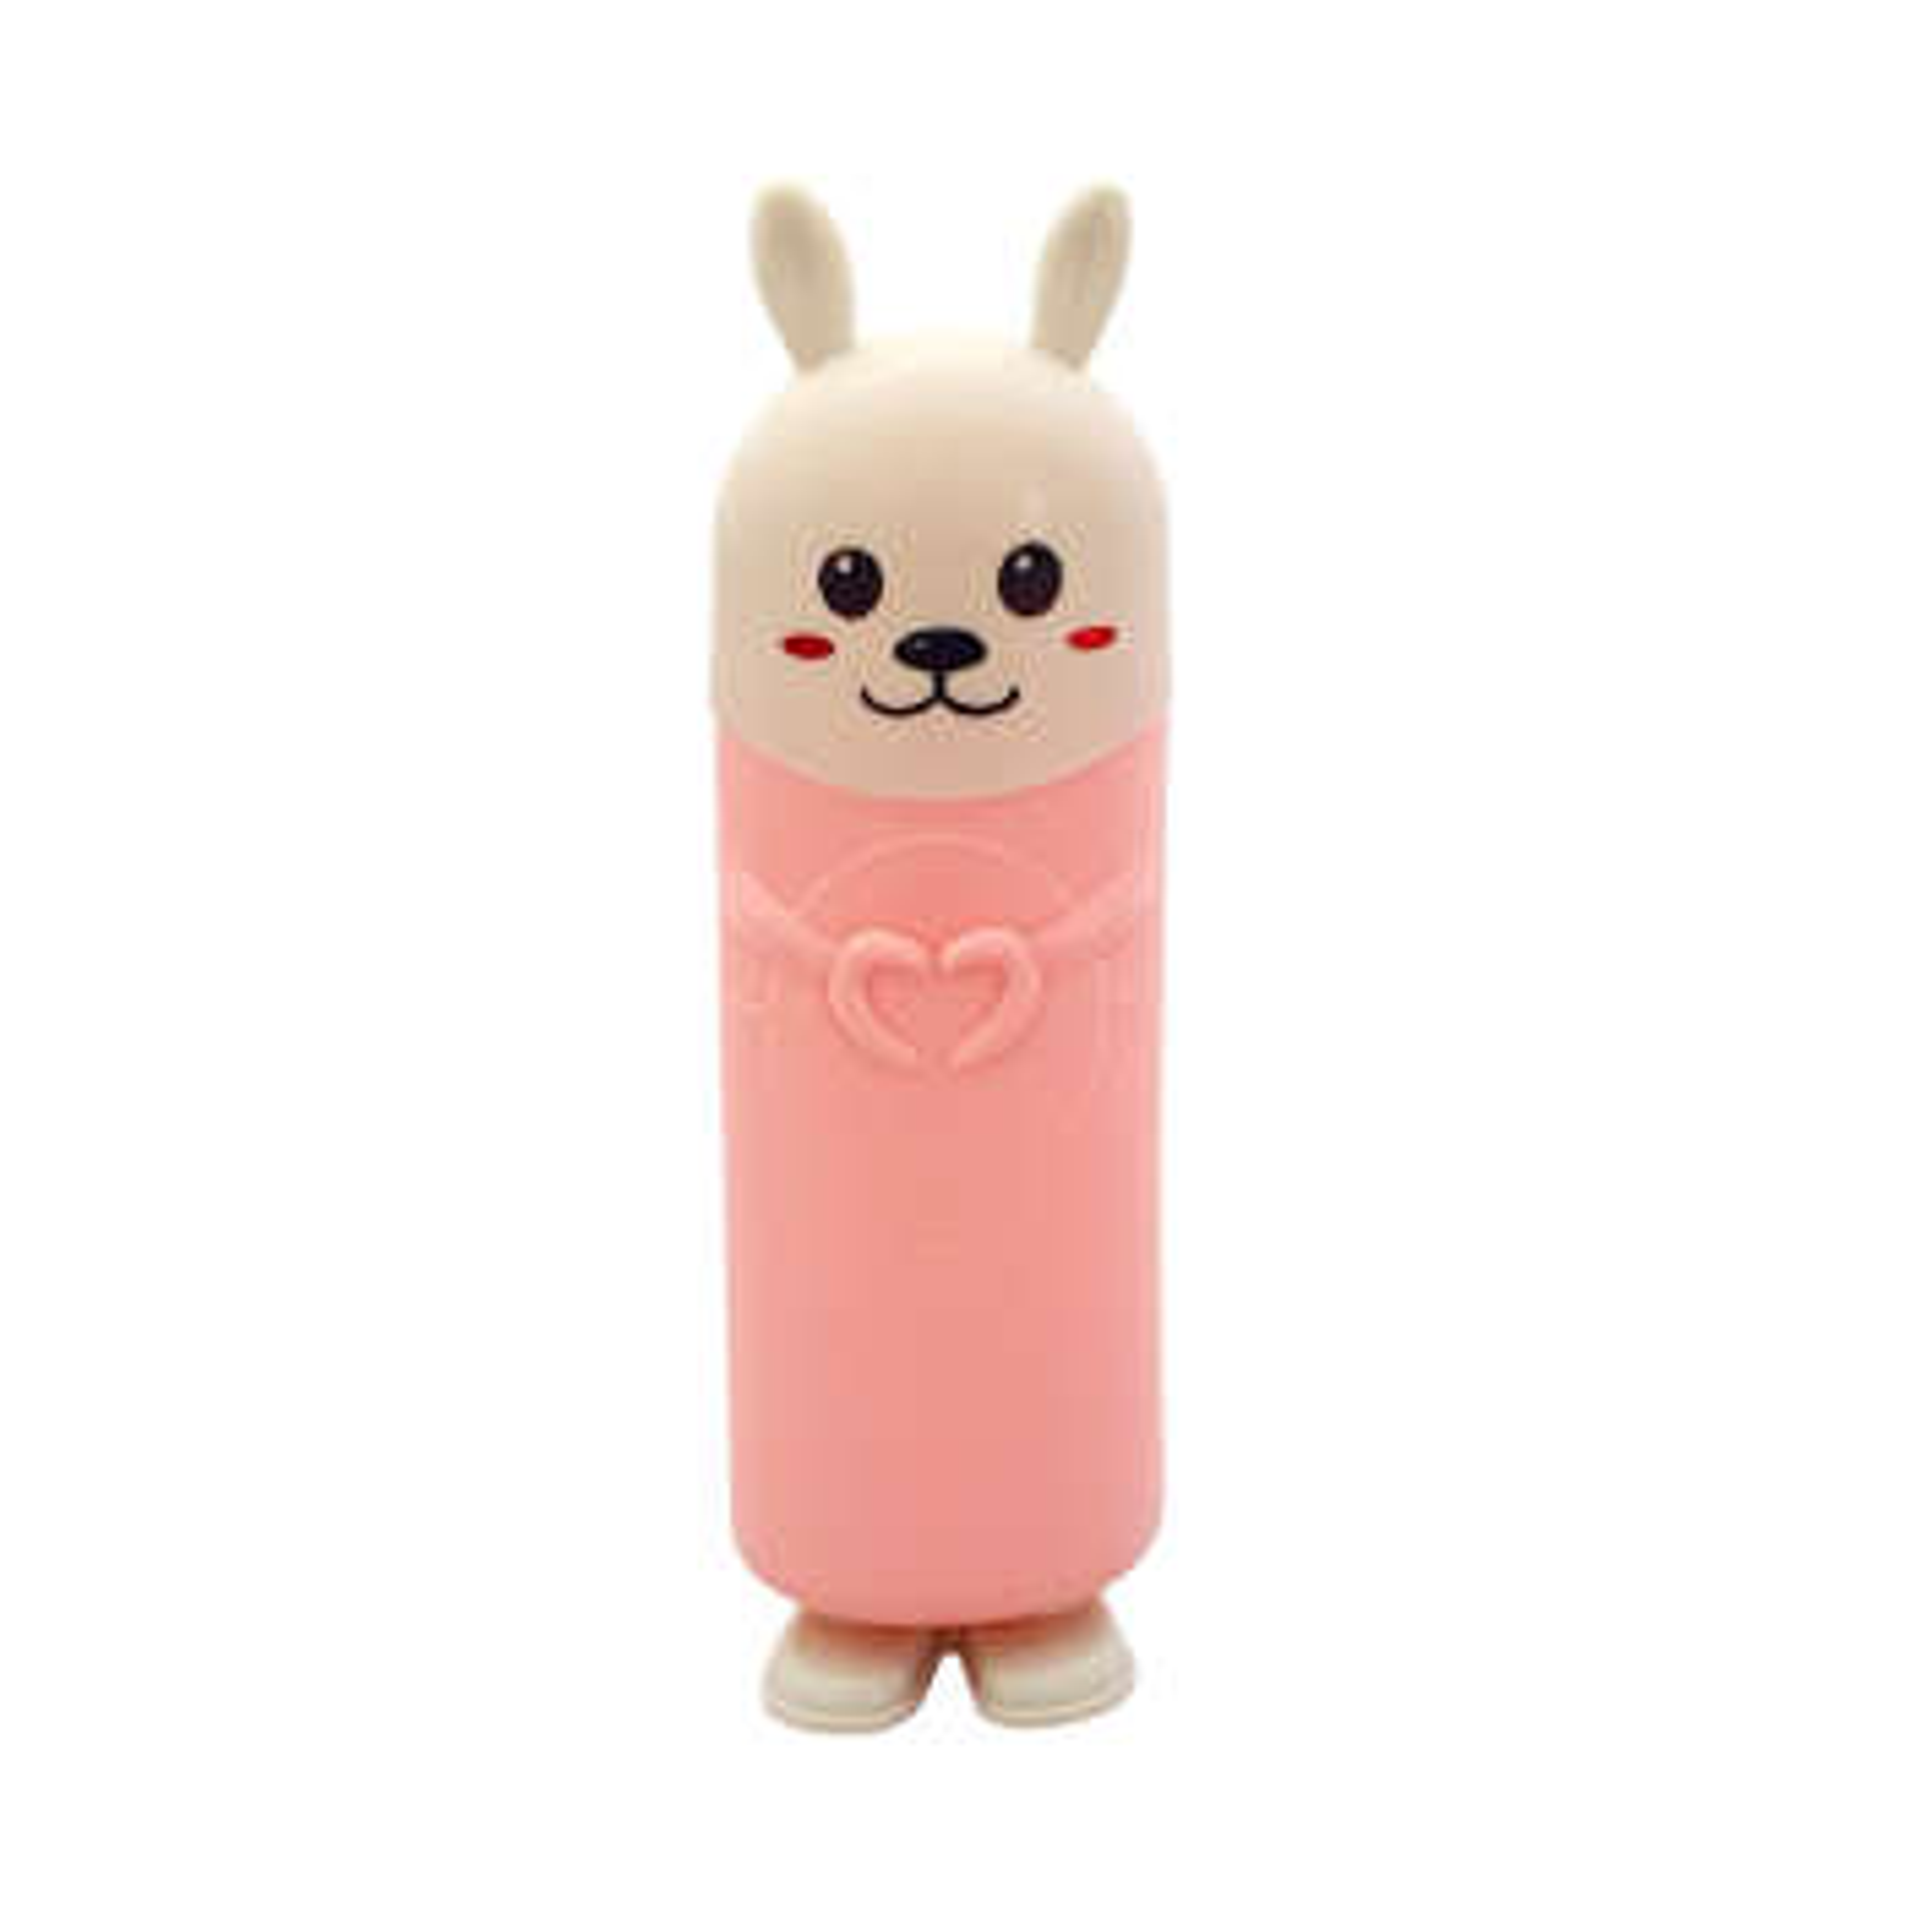 جا مسواکی طرح خرگوش مدل Rabbite